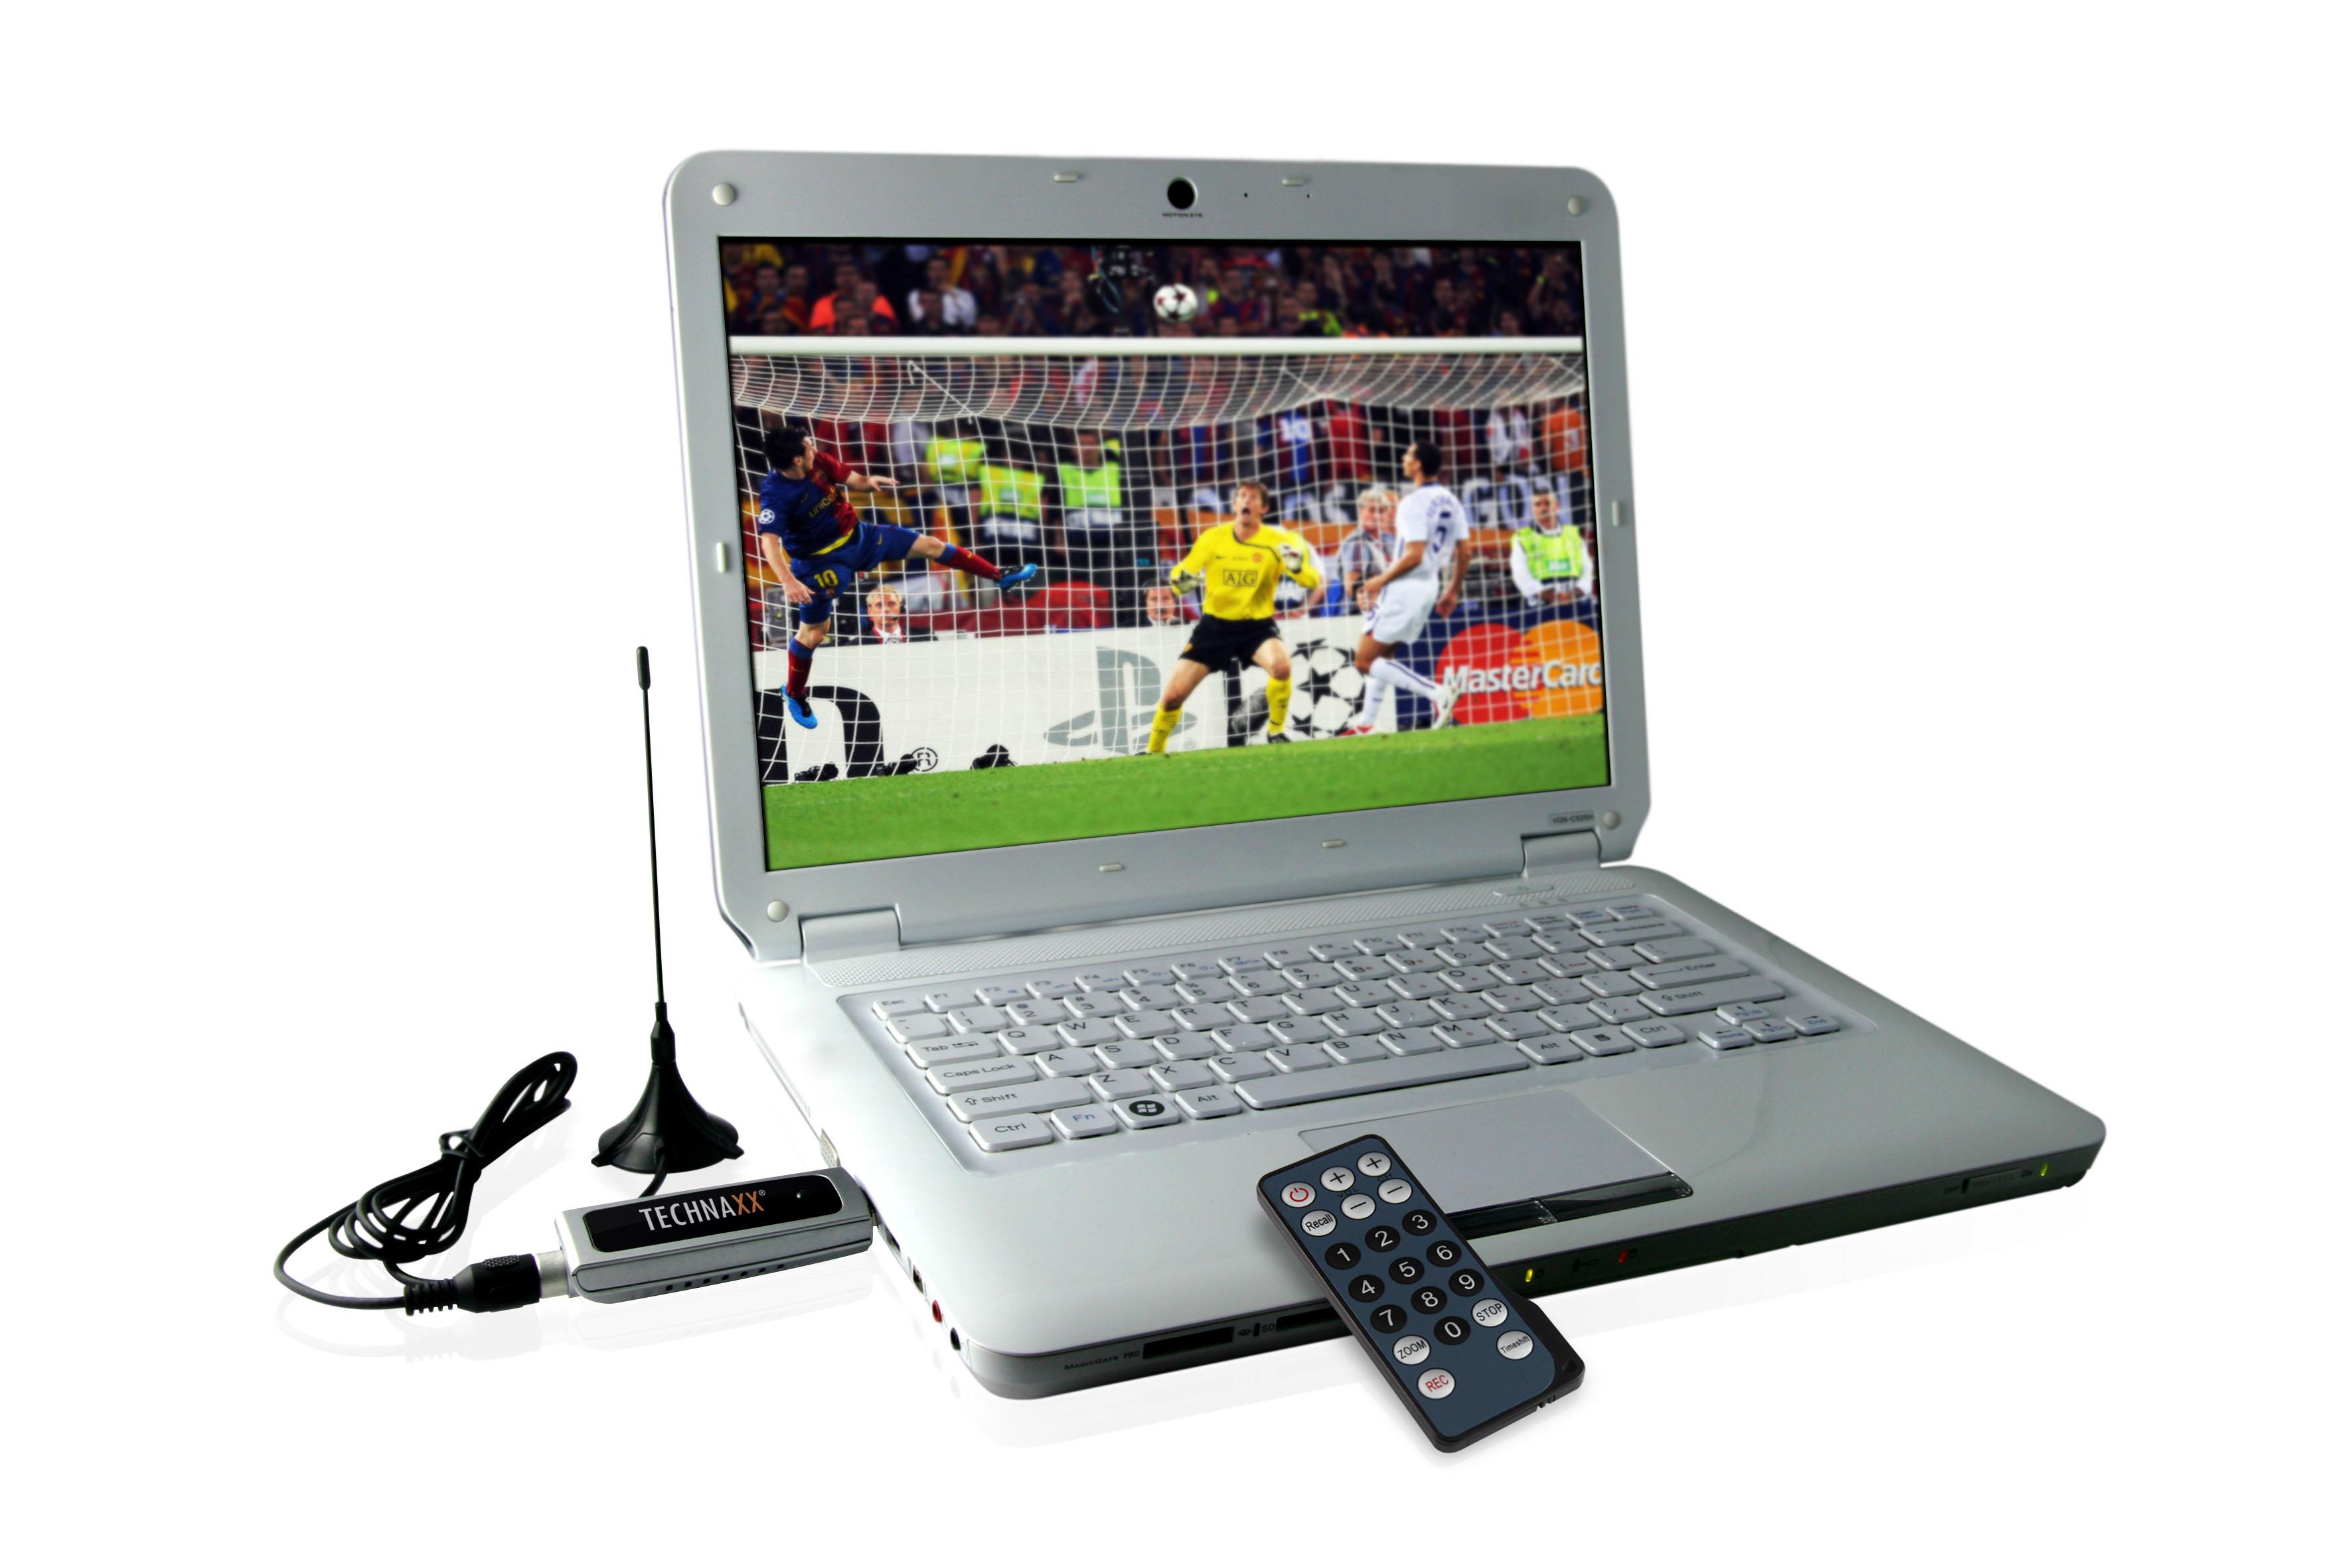 Technaxx USB tuner DVB S4 - DVB-T, HDTV, MPEG2/4